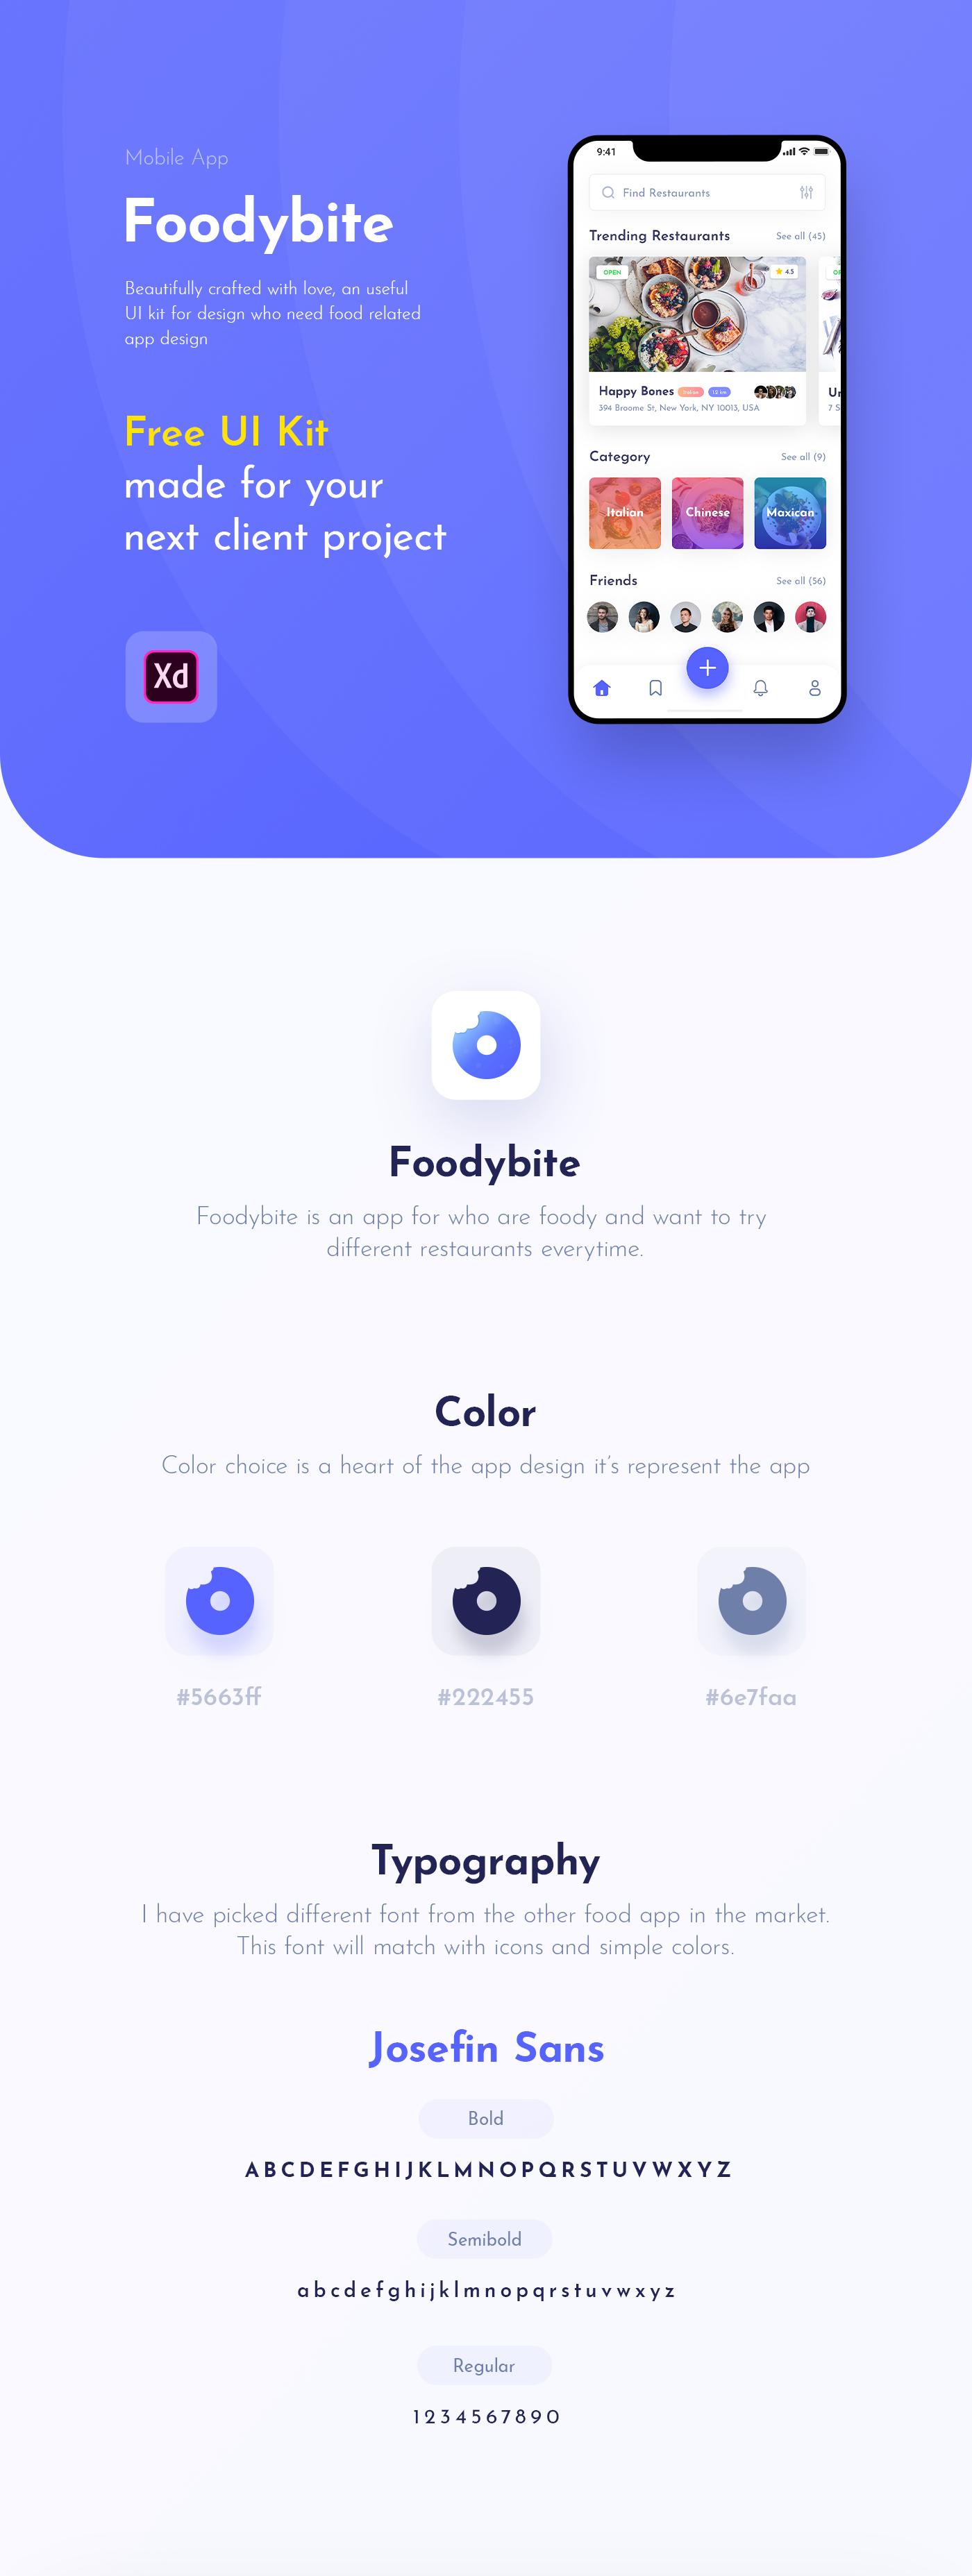 Foodybite - Free UI Kit for Adobe XD - uistore design